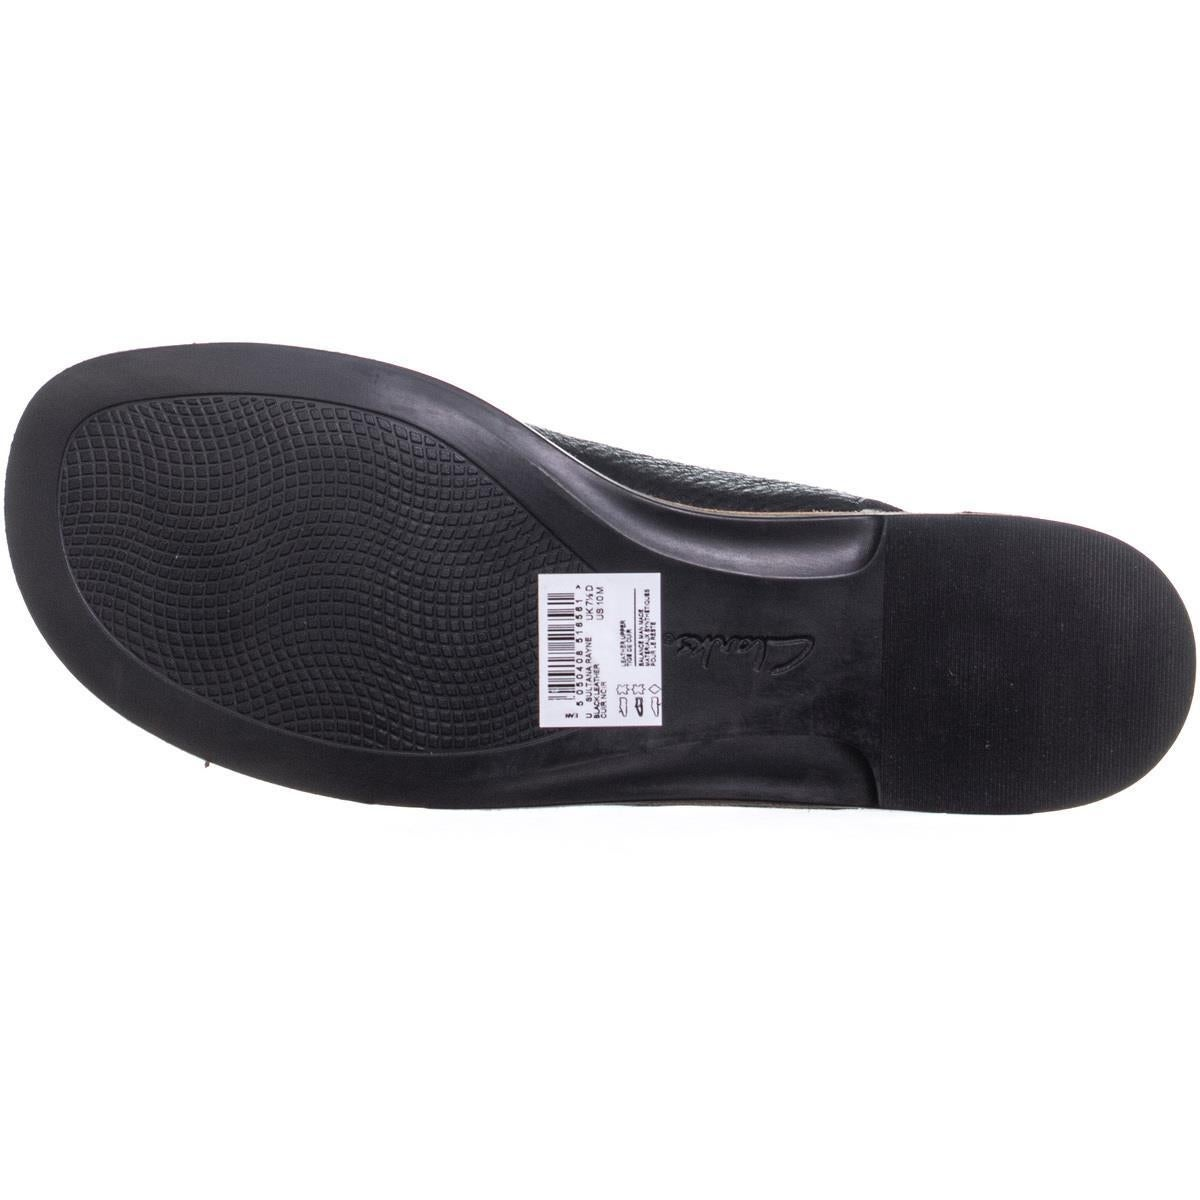 84093948e107 Shop Clarks Sultana Rayne Flat Sandals